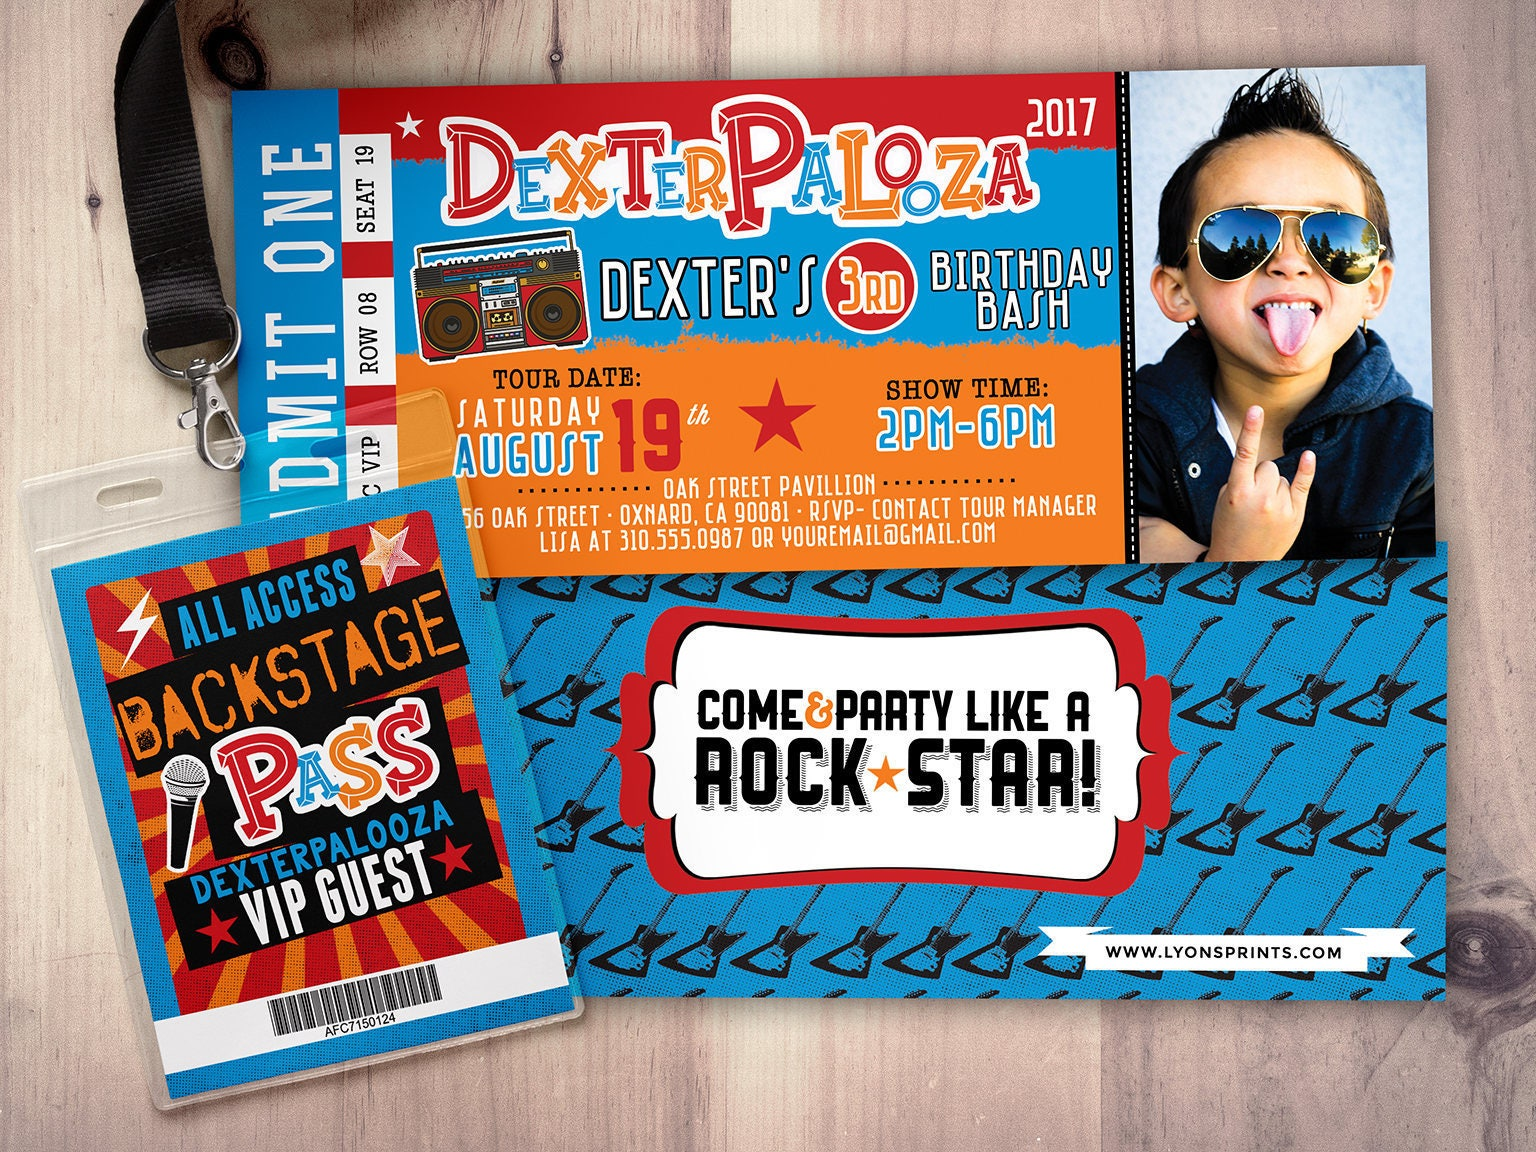 Rock star concert ticket birthday invitation girl birthday rock star concert ticket birthday invitation girl birthday invitation pop star birthday invitation music birthday invitation lollapalooza filmwisefo Images